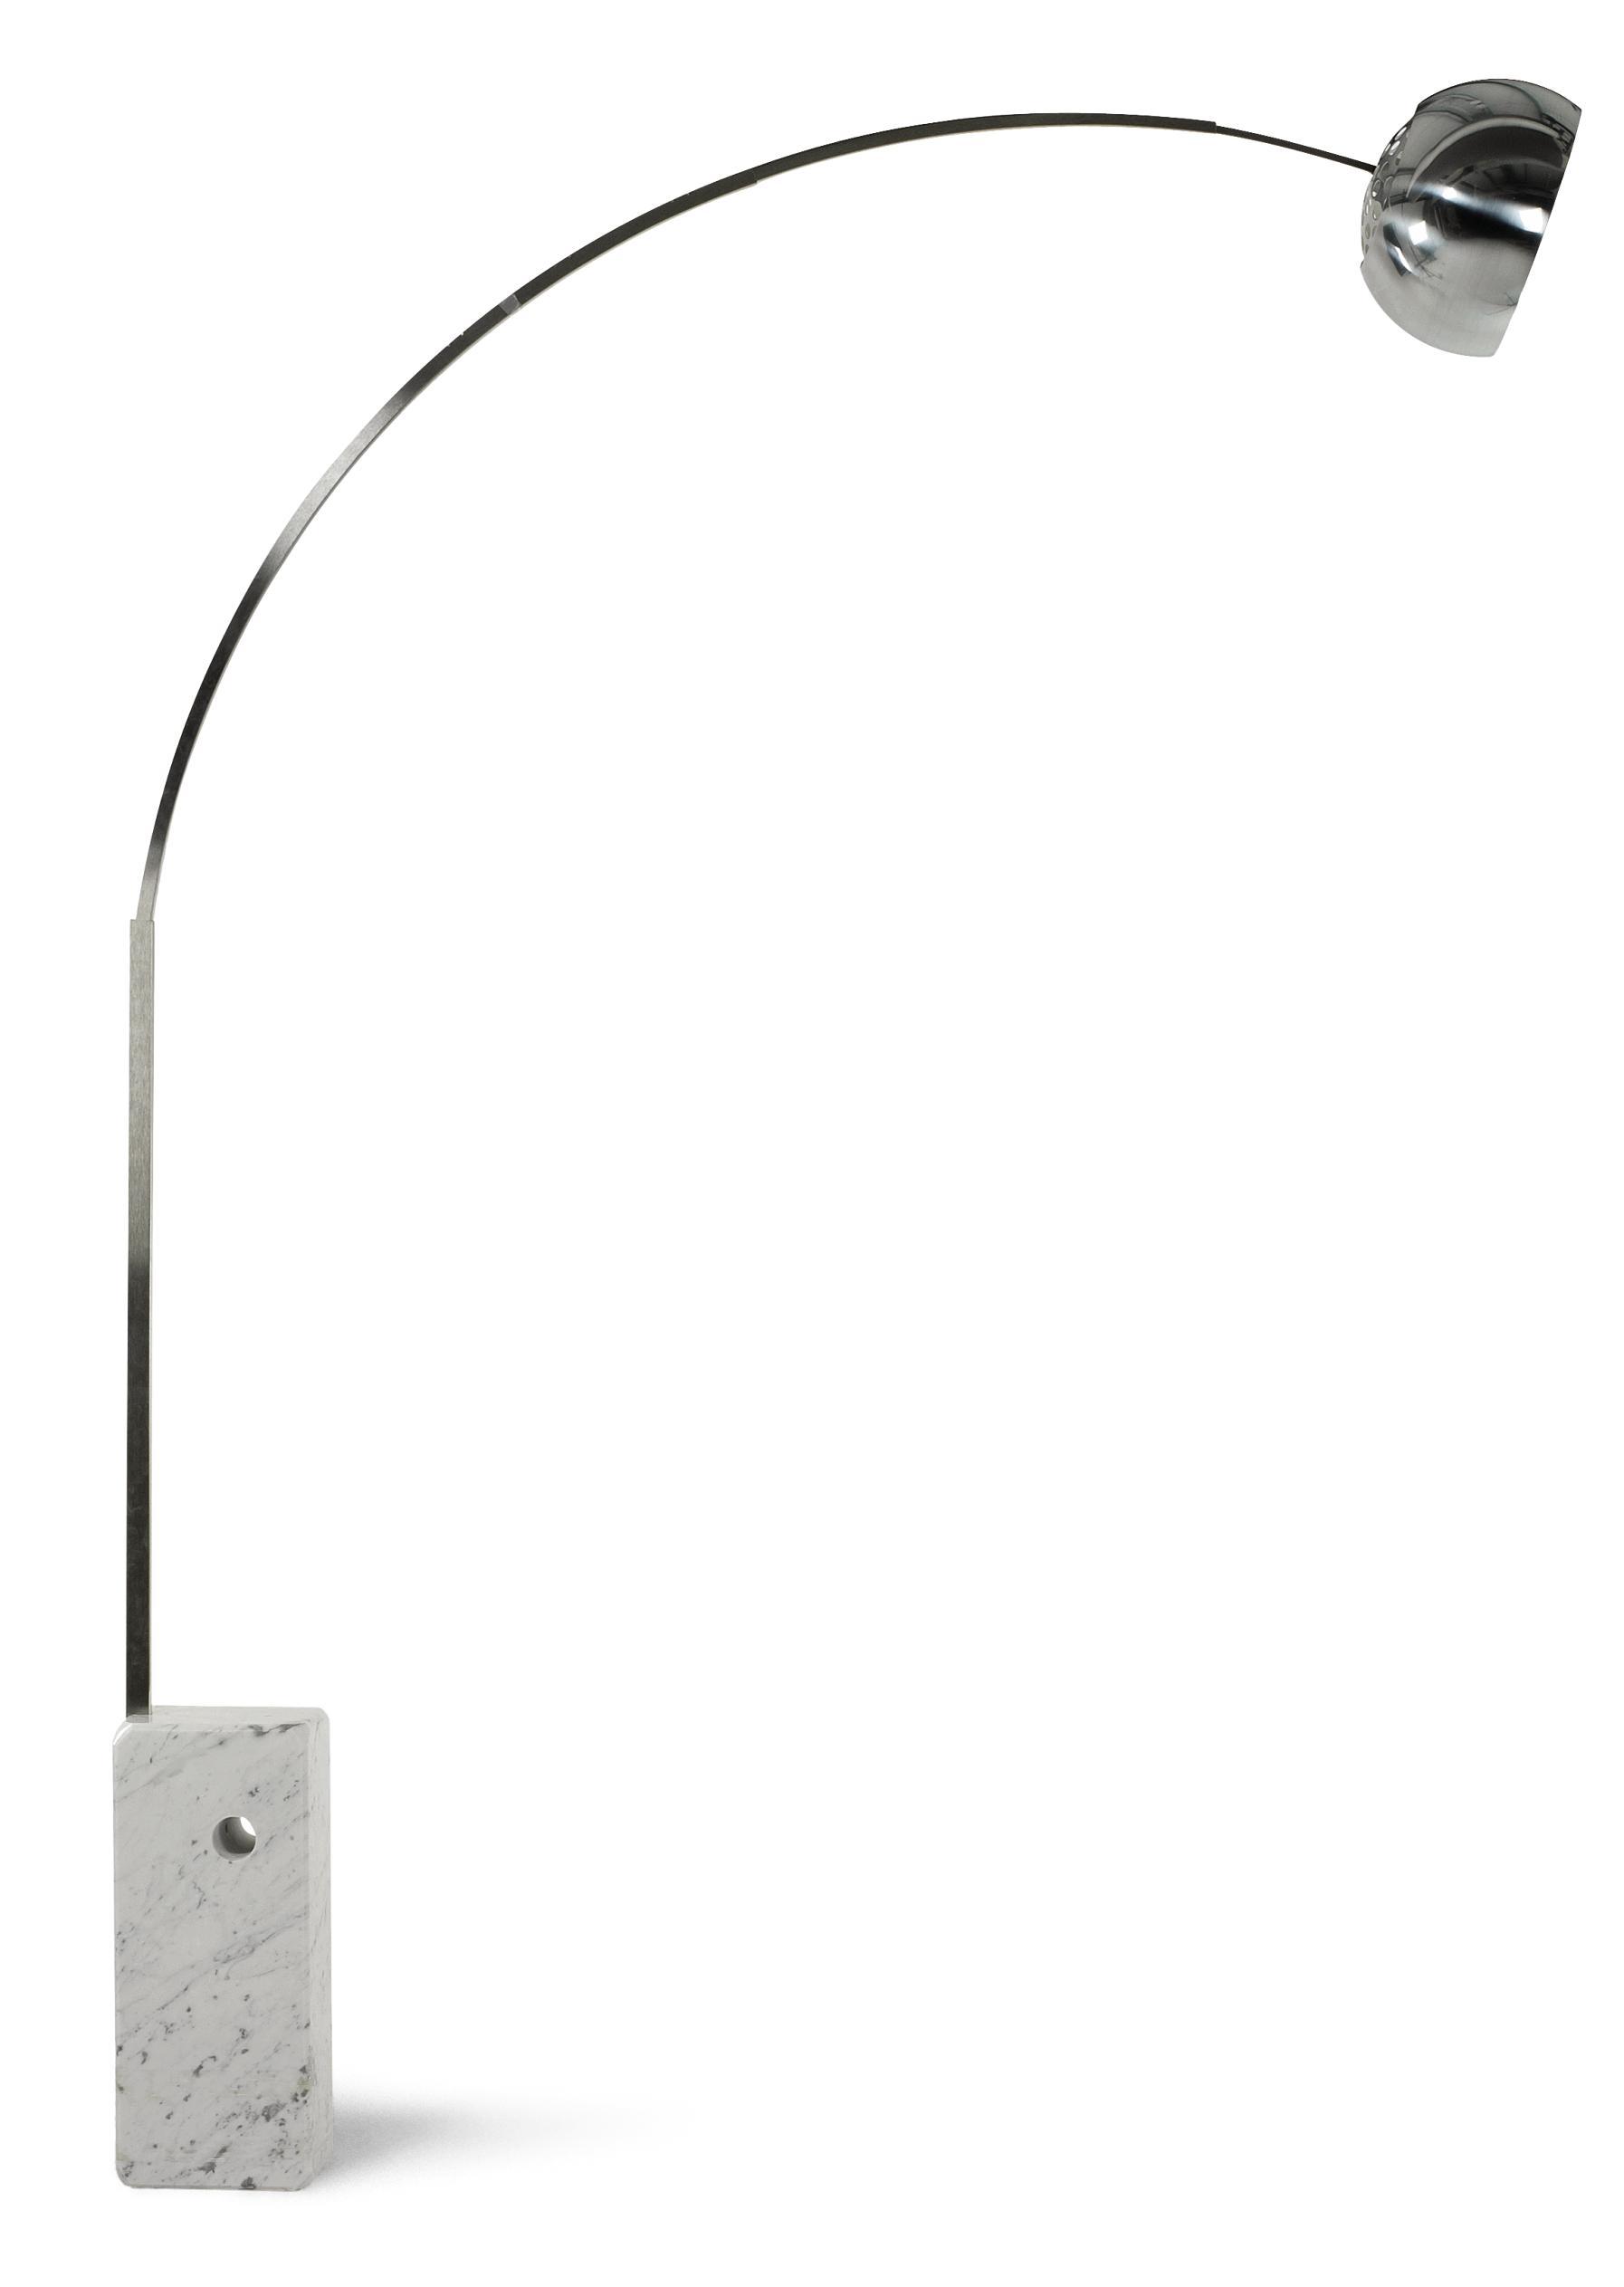 AN ARCO FLOOR LAMP, DESIGNED 1962